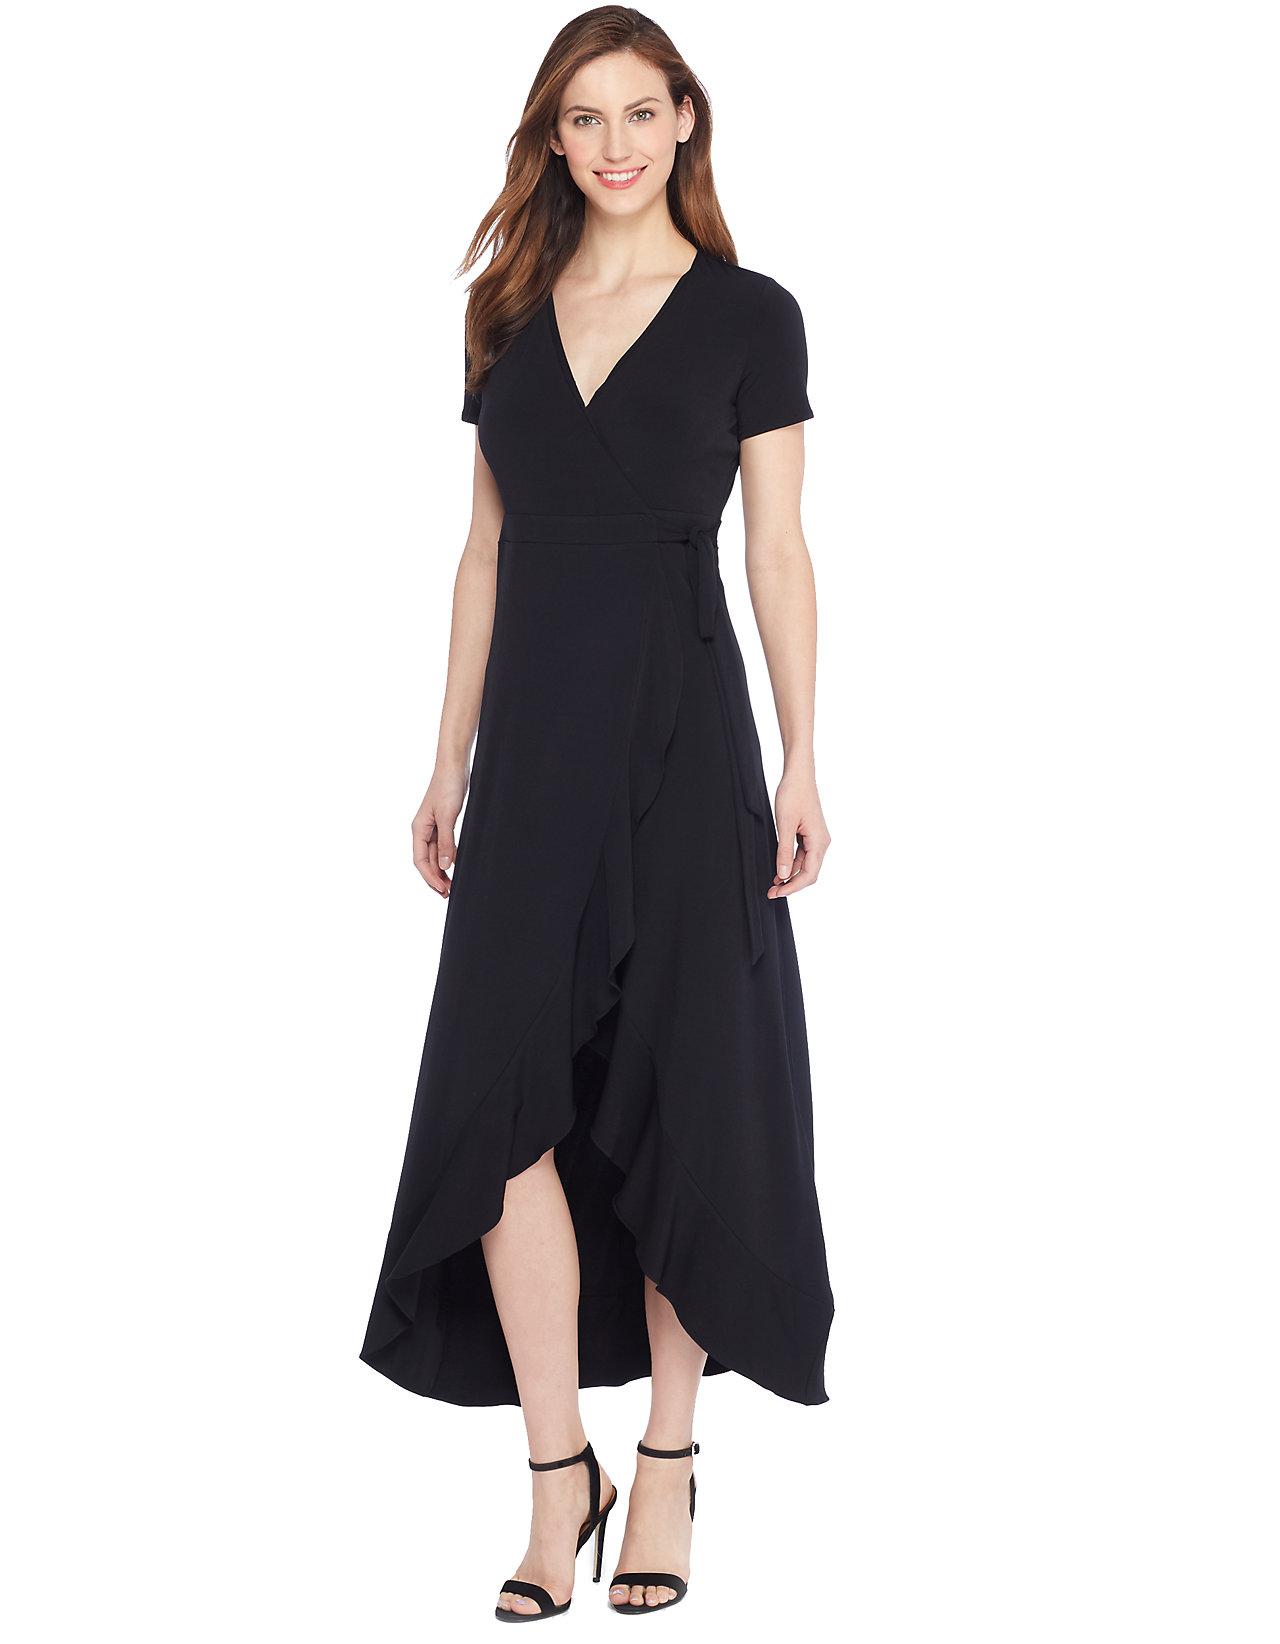 bbce968b3dcd Belk Petite Special Occasion Dresses